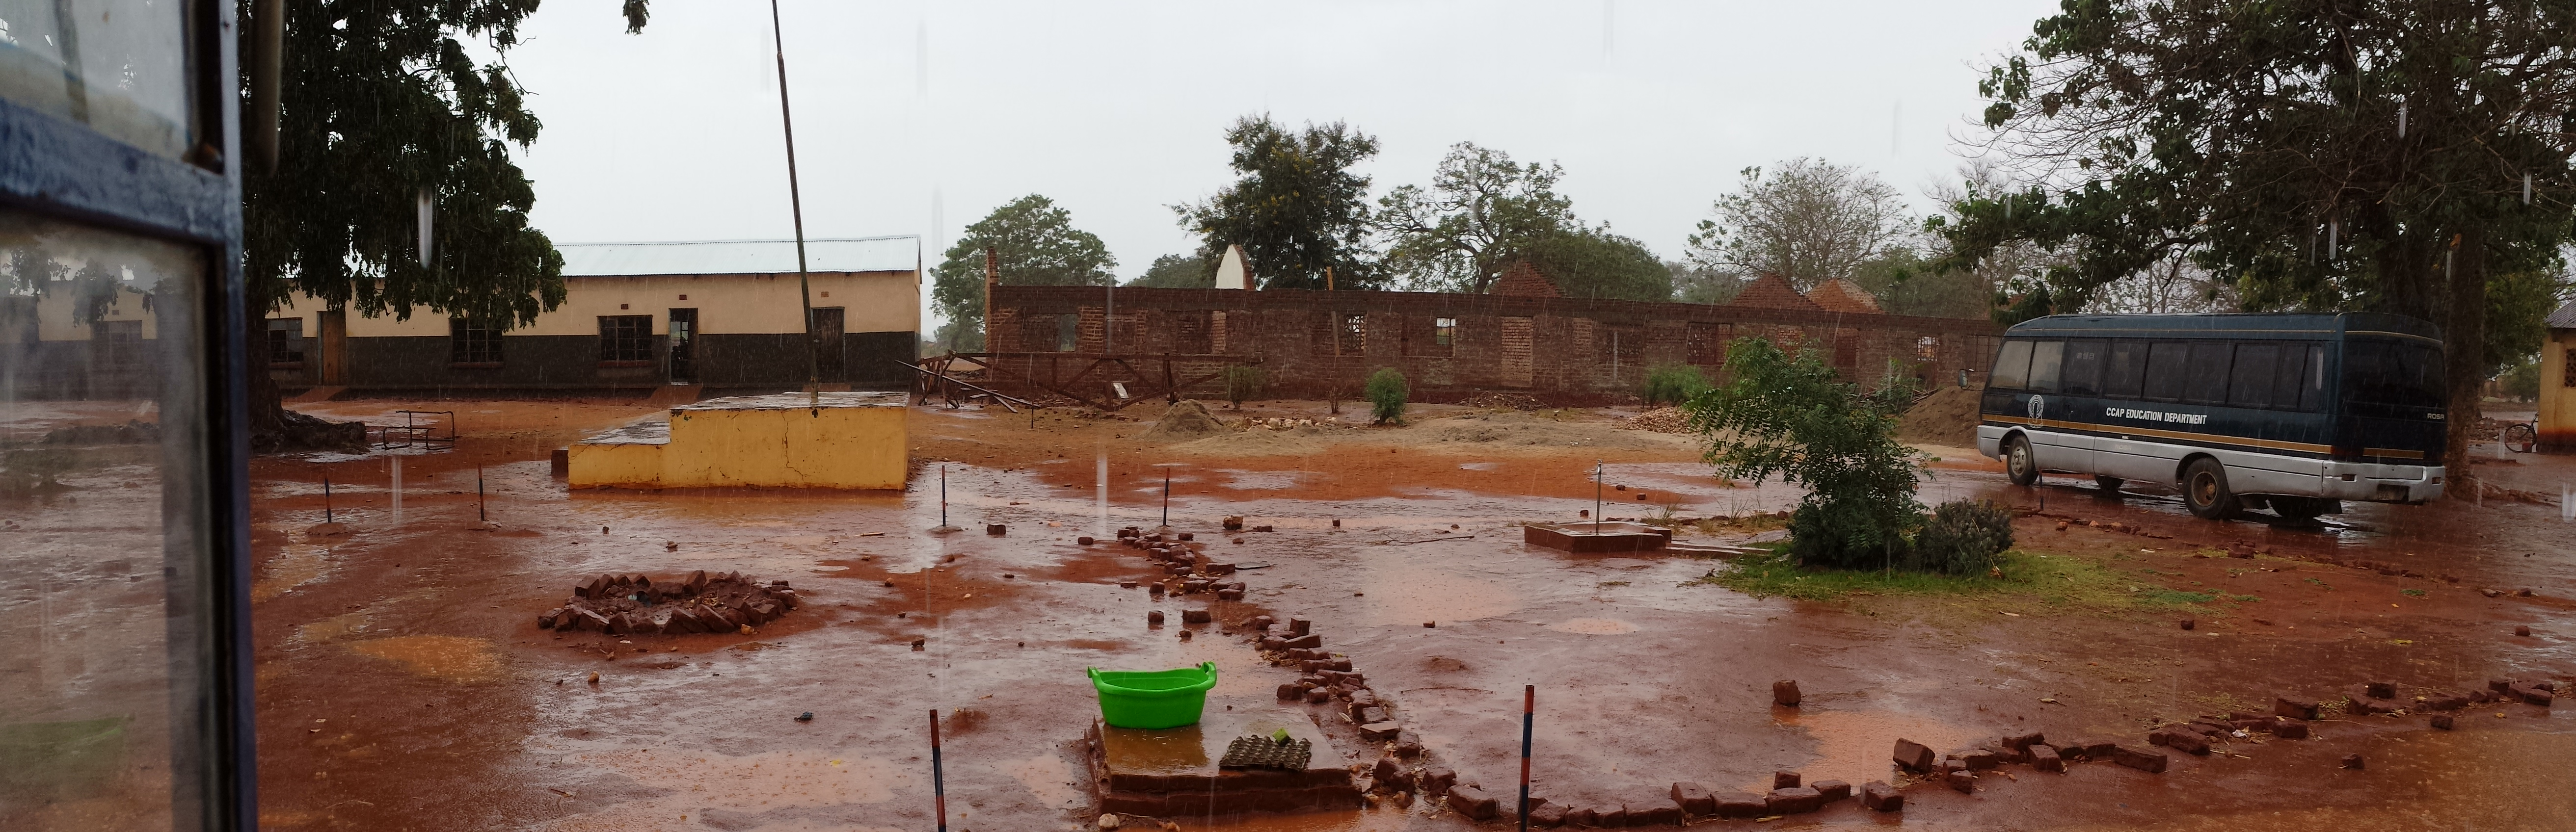 Mphamba unfinished